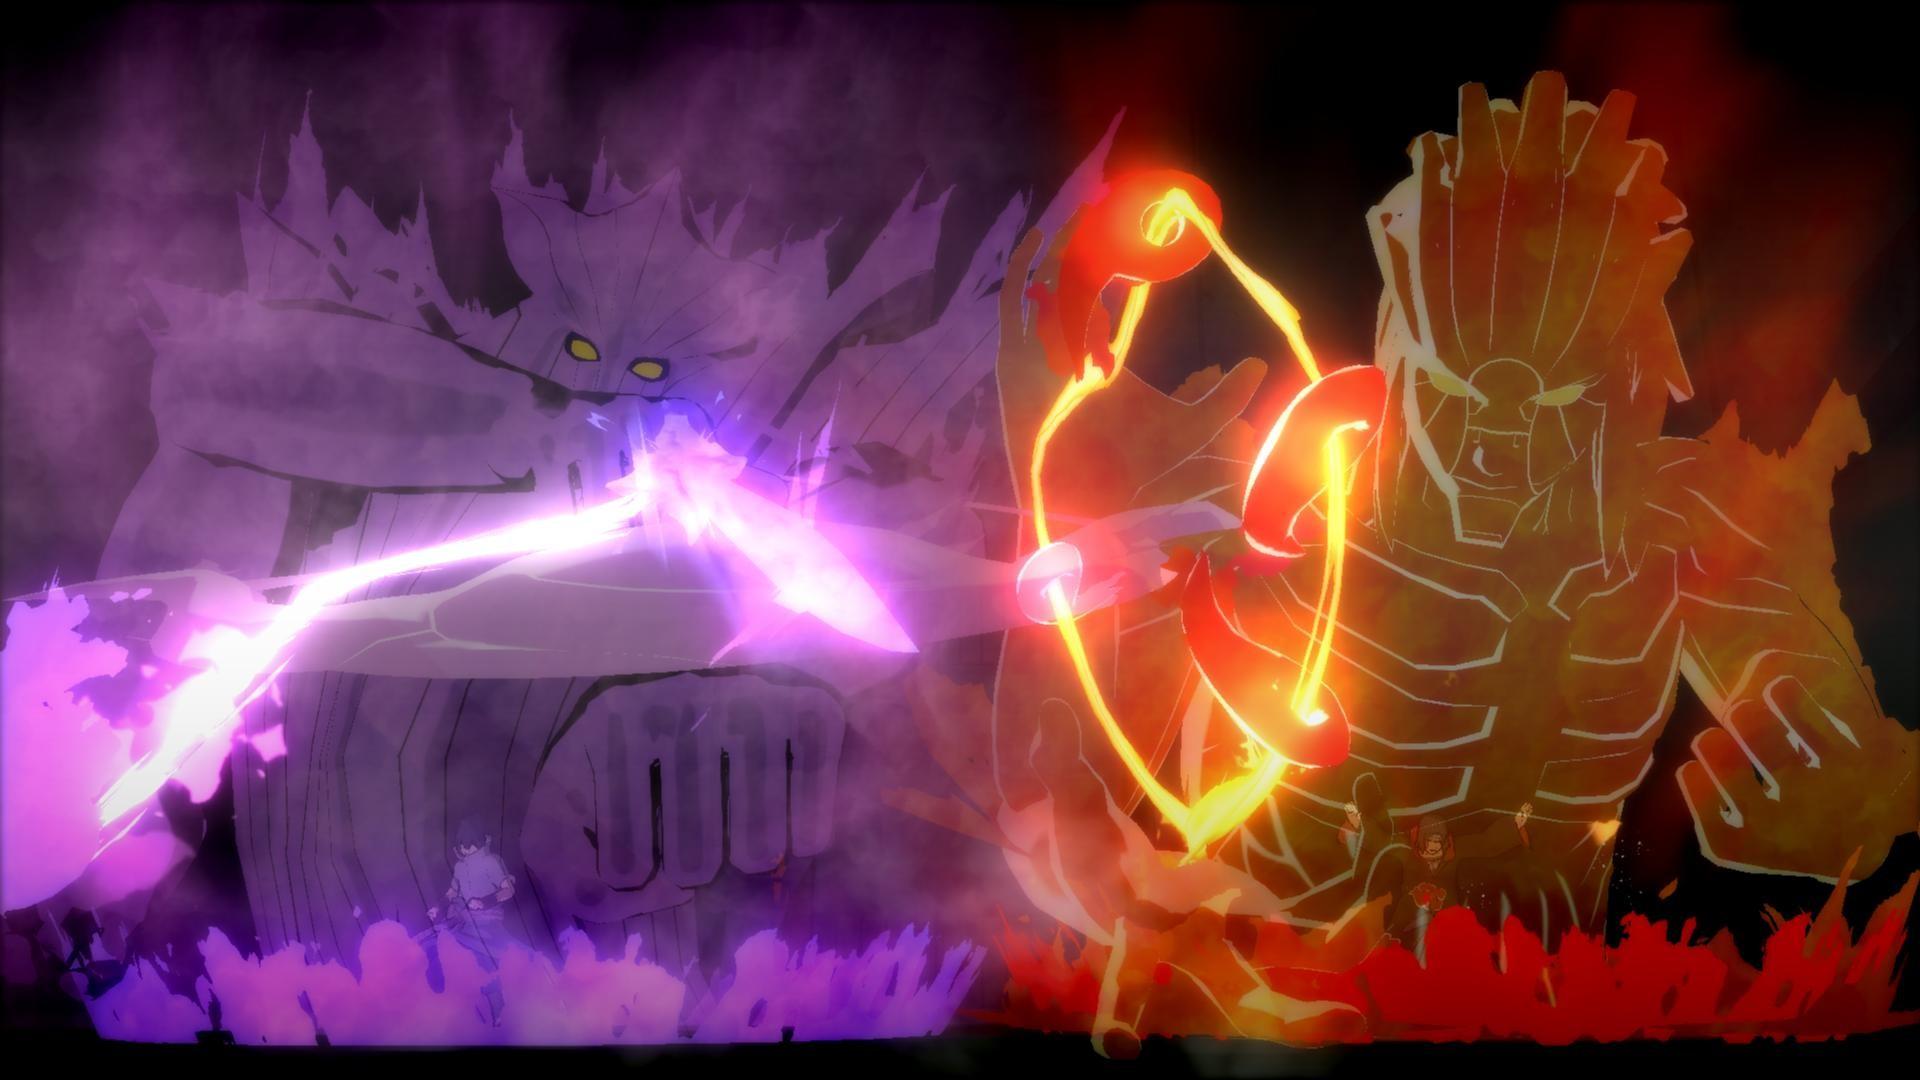 16 Susanoo (Naruto) HD Wallpapers